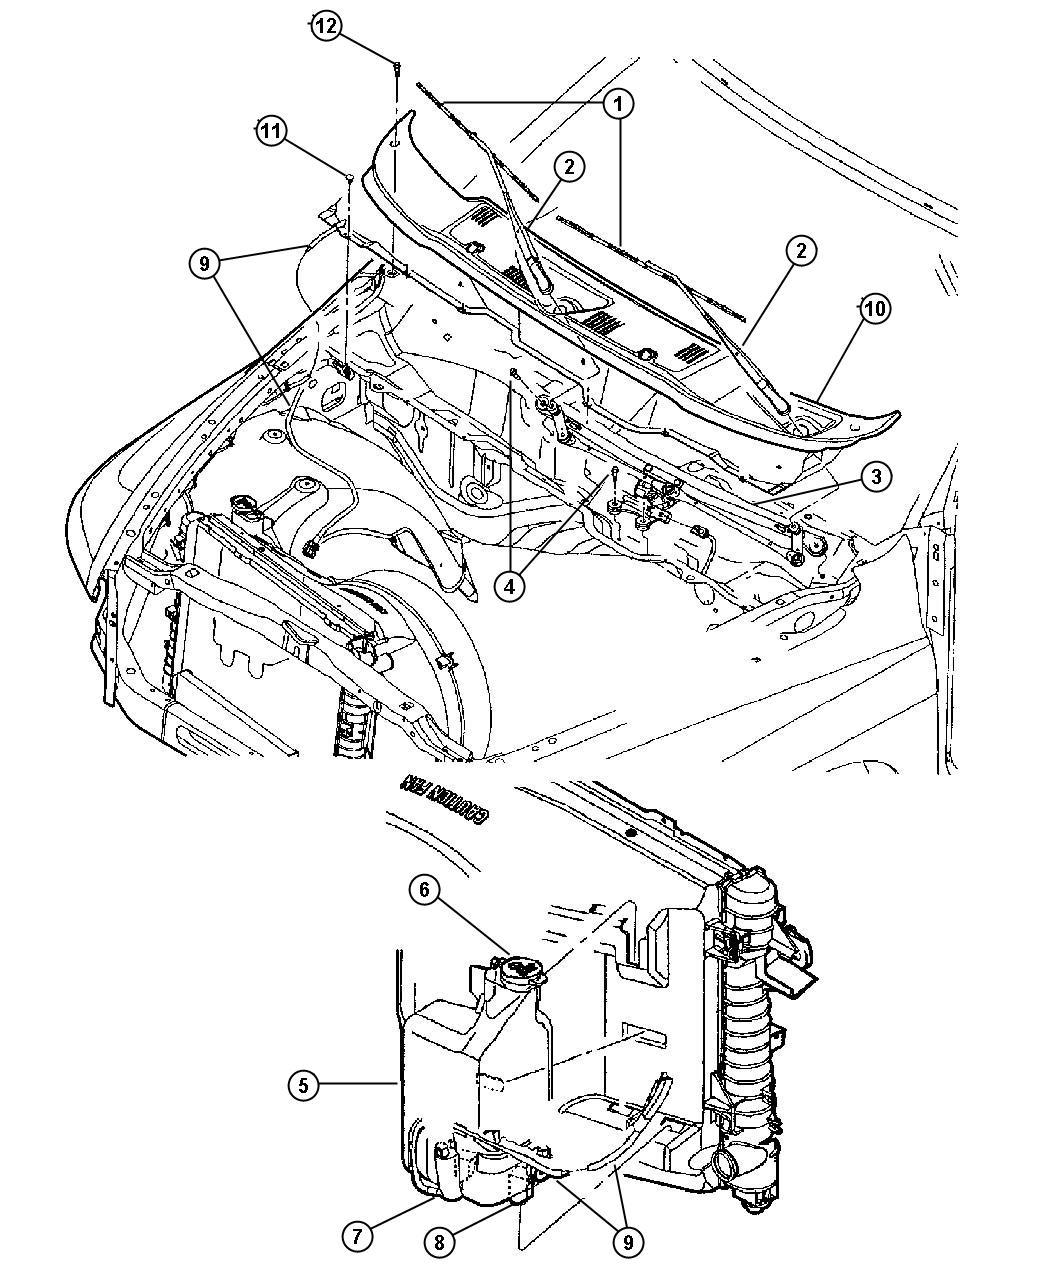 2004 Dodge Ram 1500 Windshield Wiper & Washer.